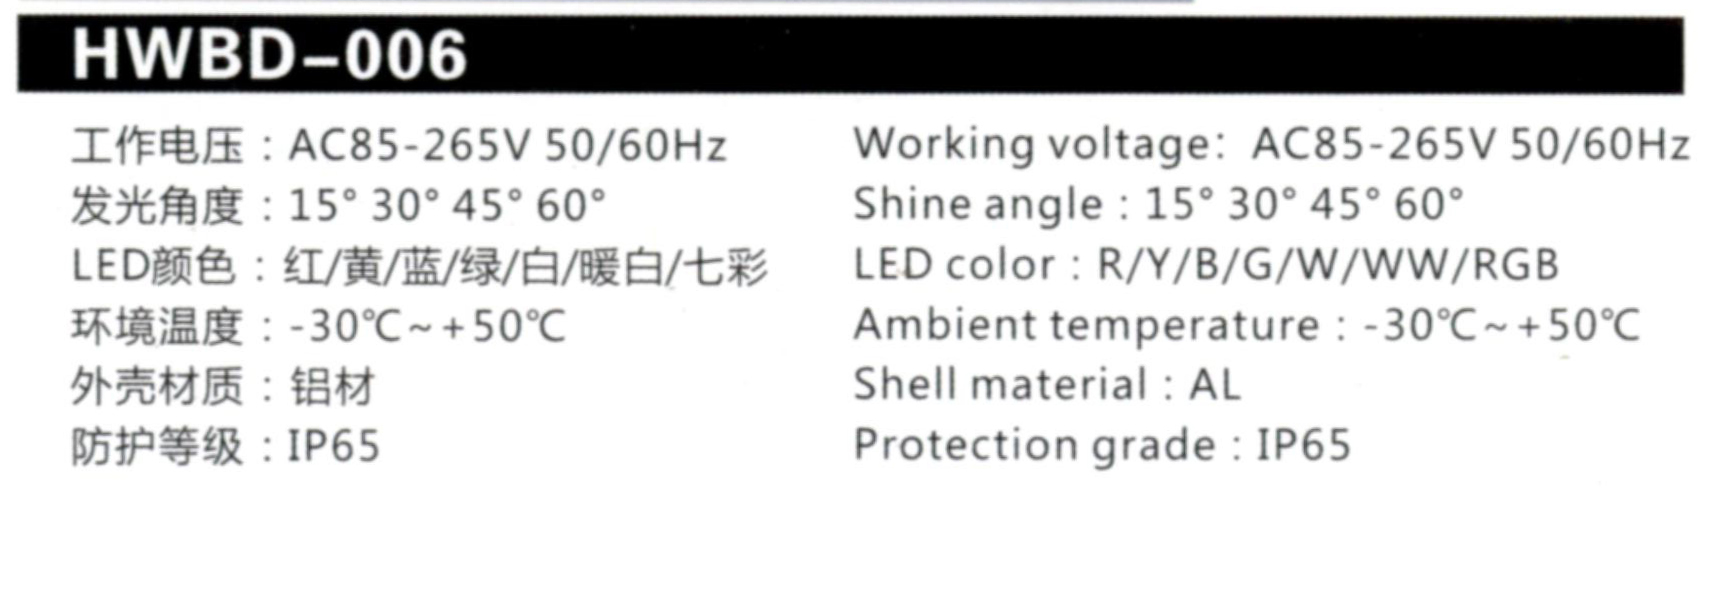 LED户外壁灯Model∶HWBD-006参数.jpg